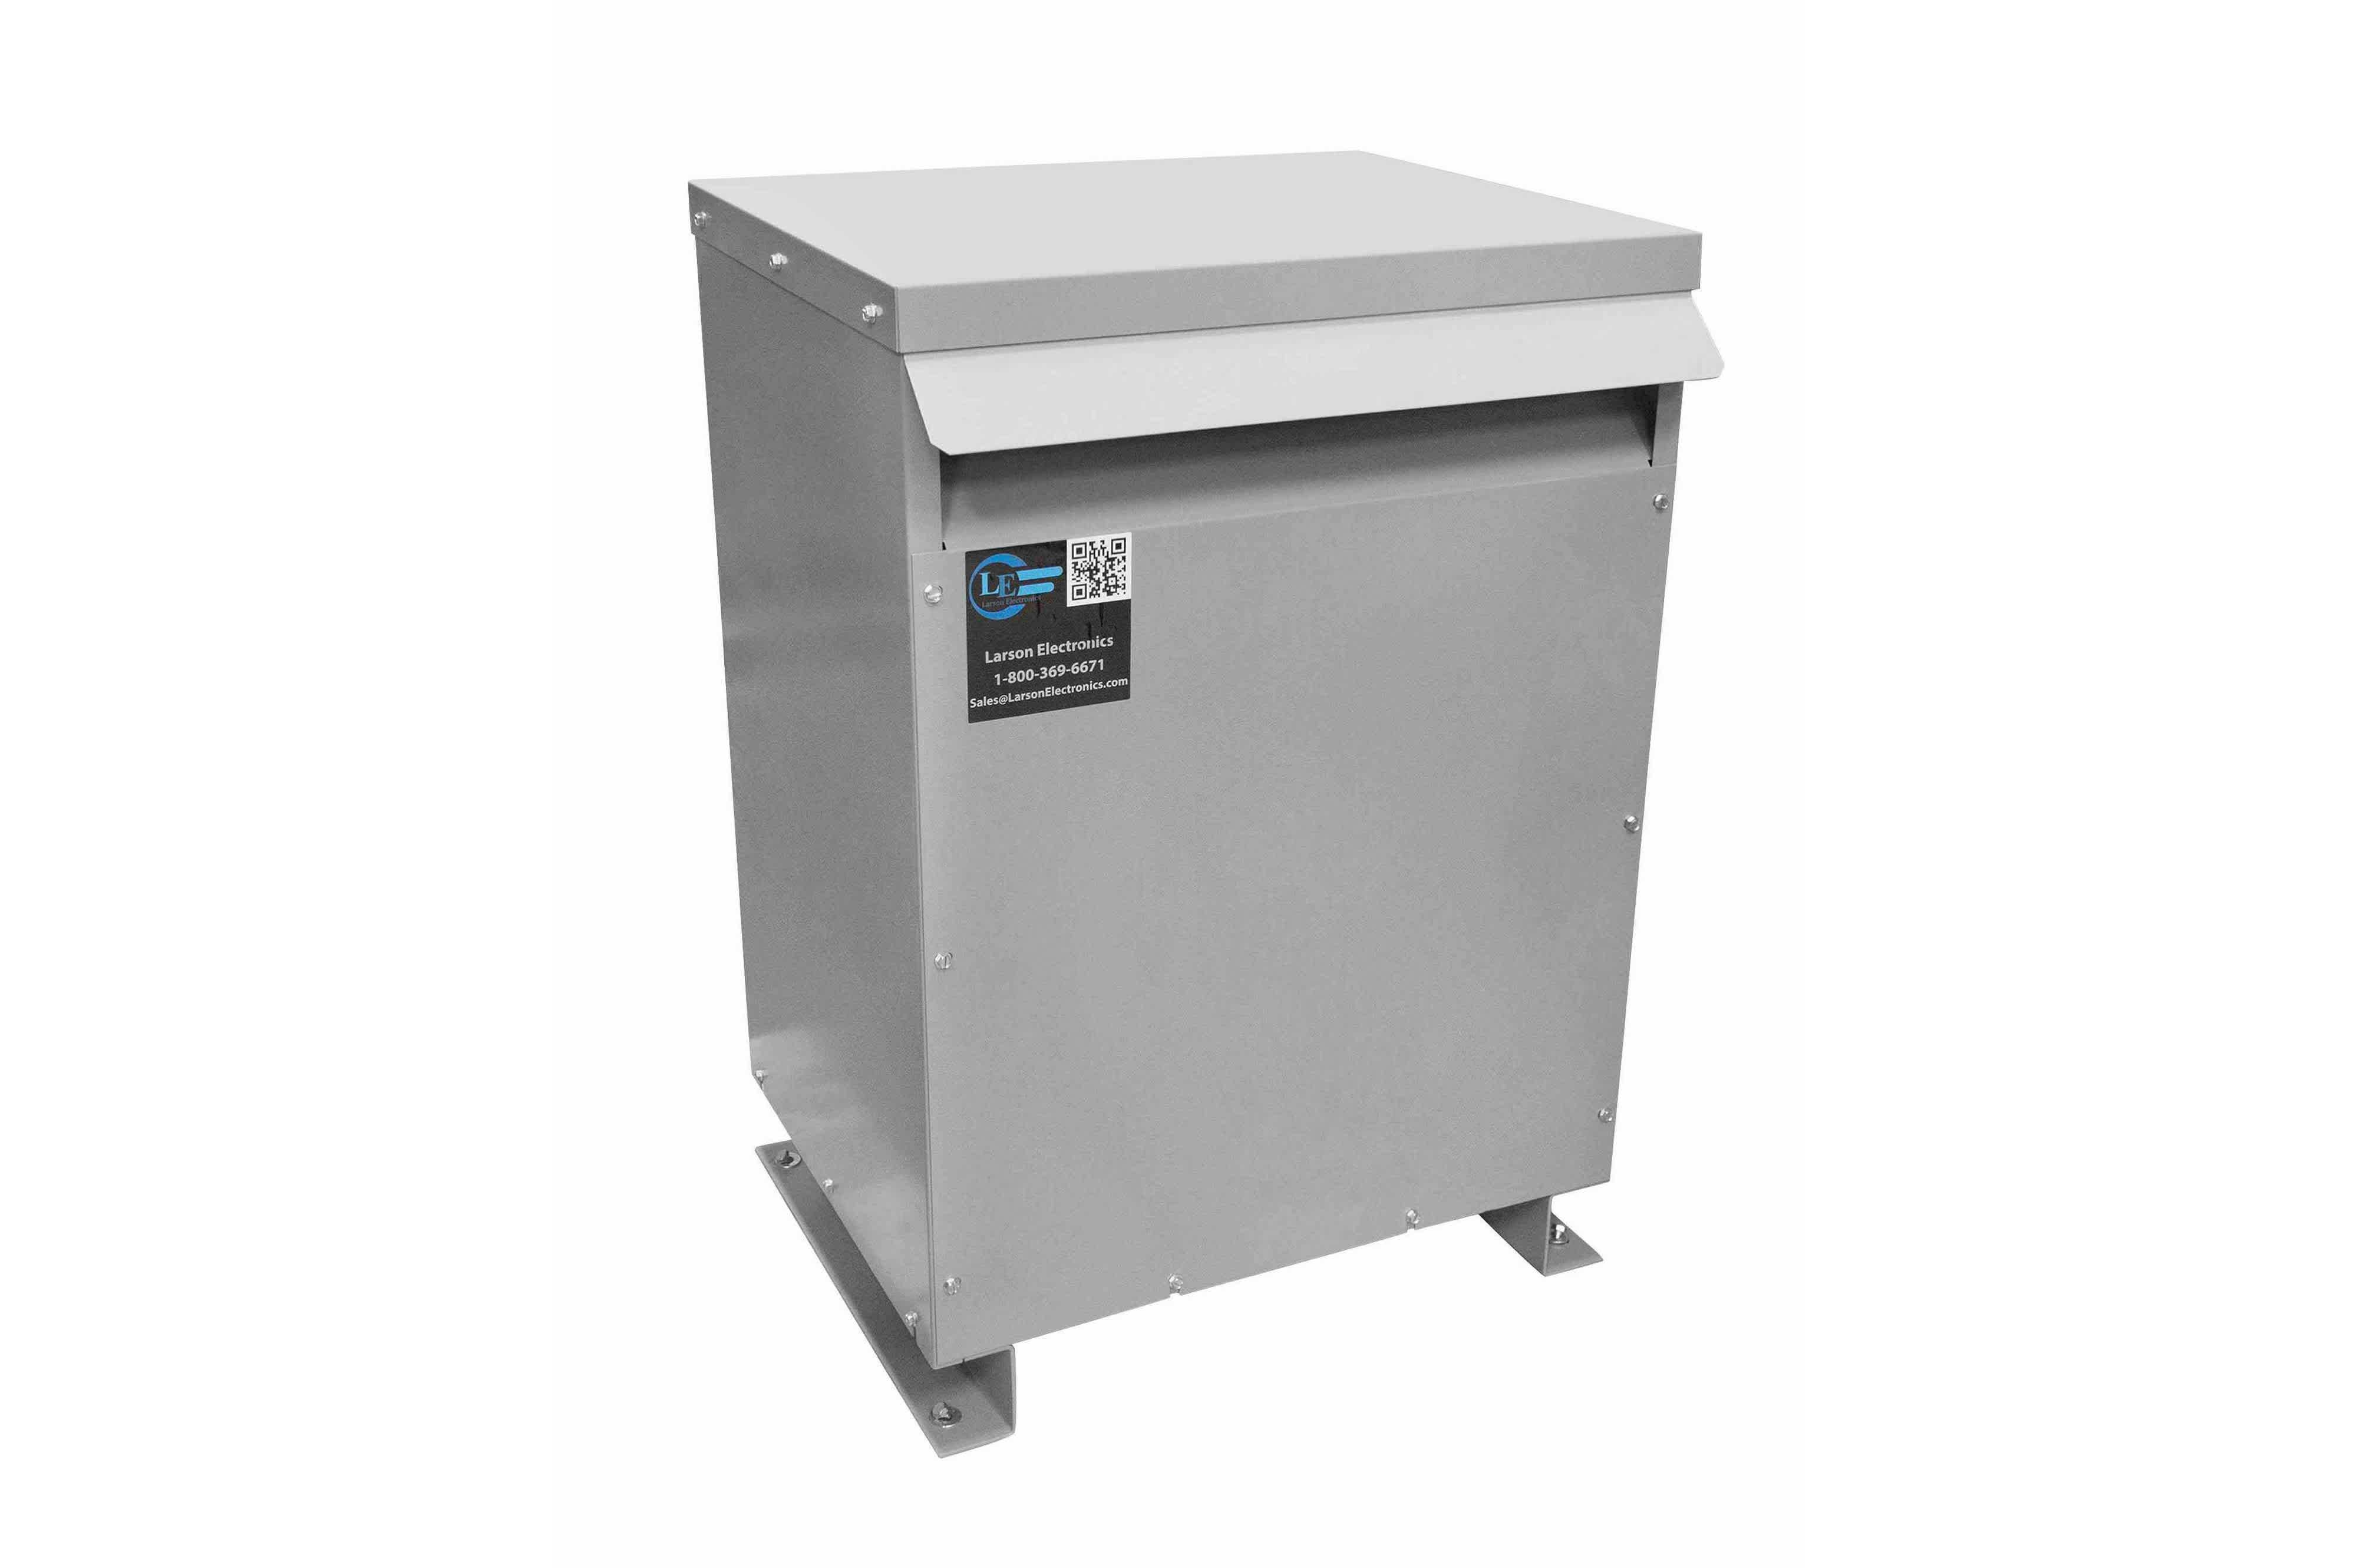 500 kVA 3PH Isolation Transformer, 220V Wye Primary, 480V Delta Secondary, N3R, Ventilated, 60 Hz